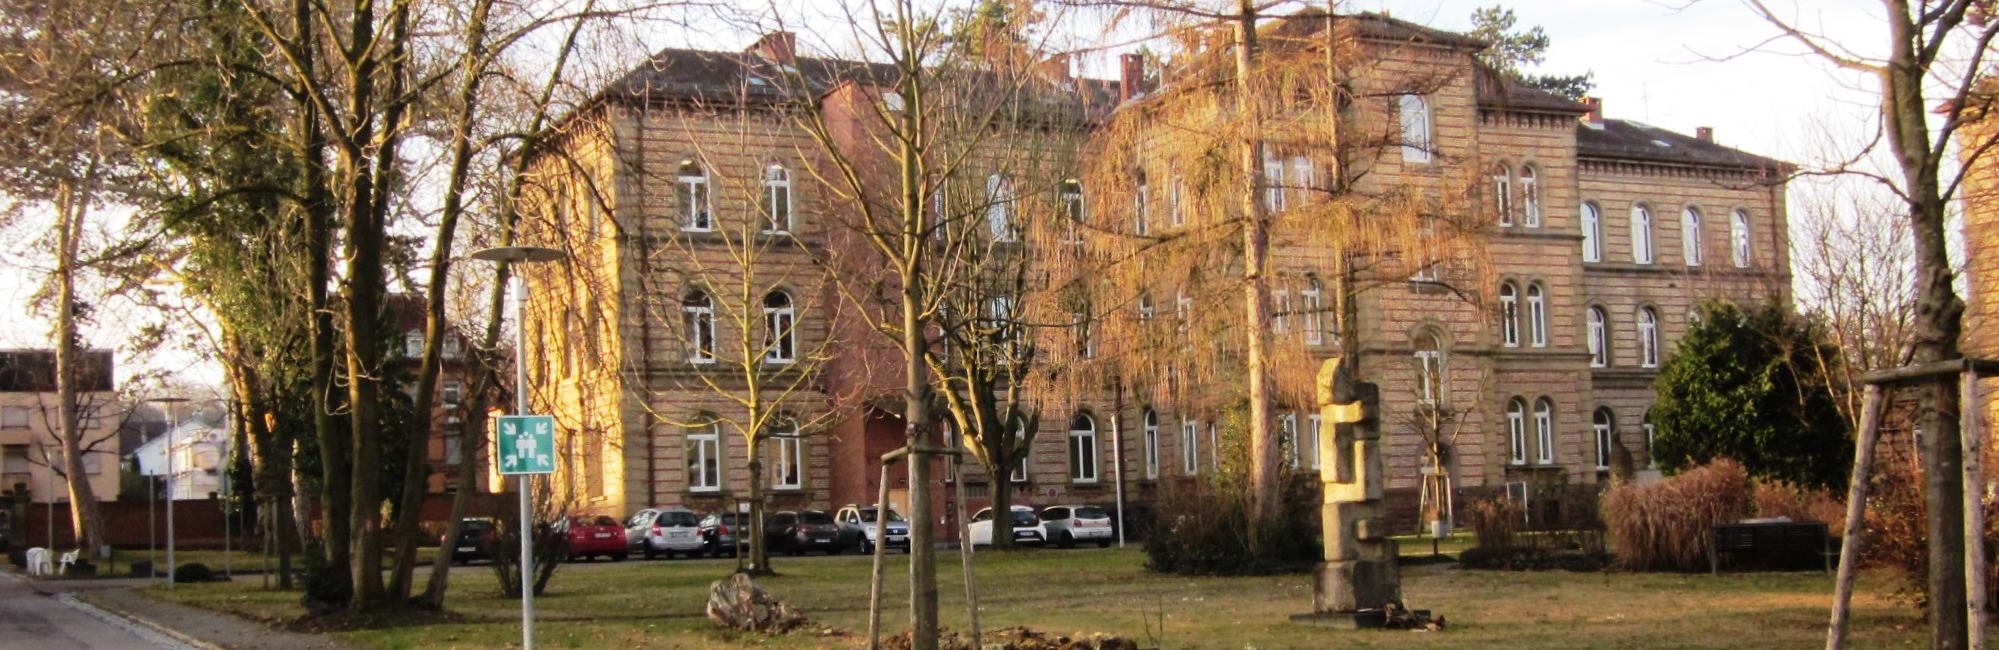 Gebäude Königsallee 59/2 mit Bäumen davor ka.jpg